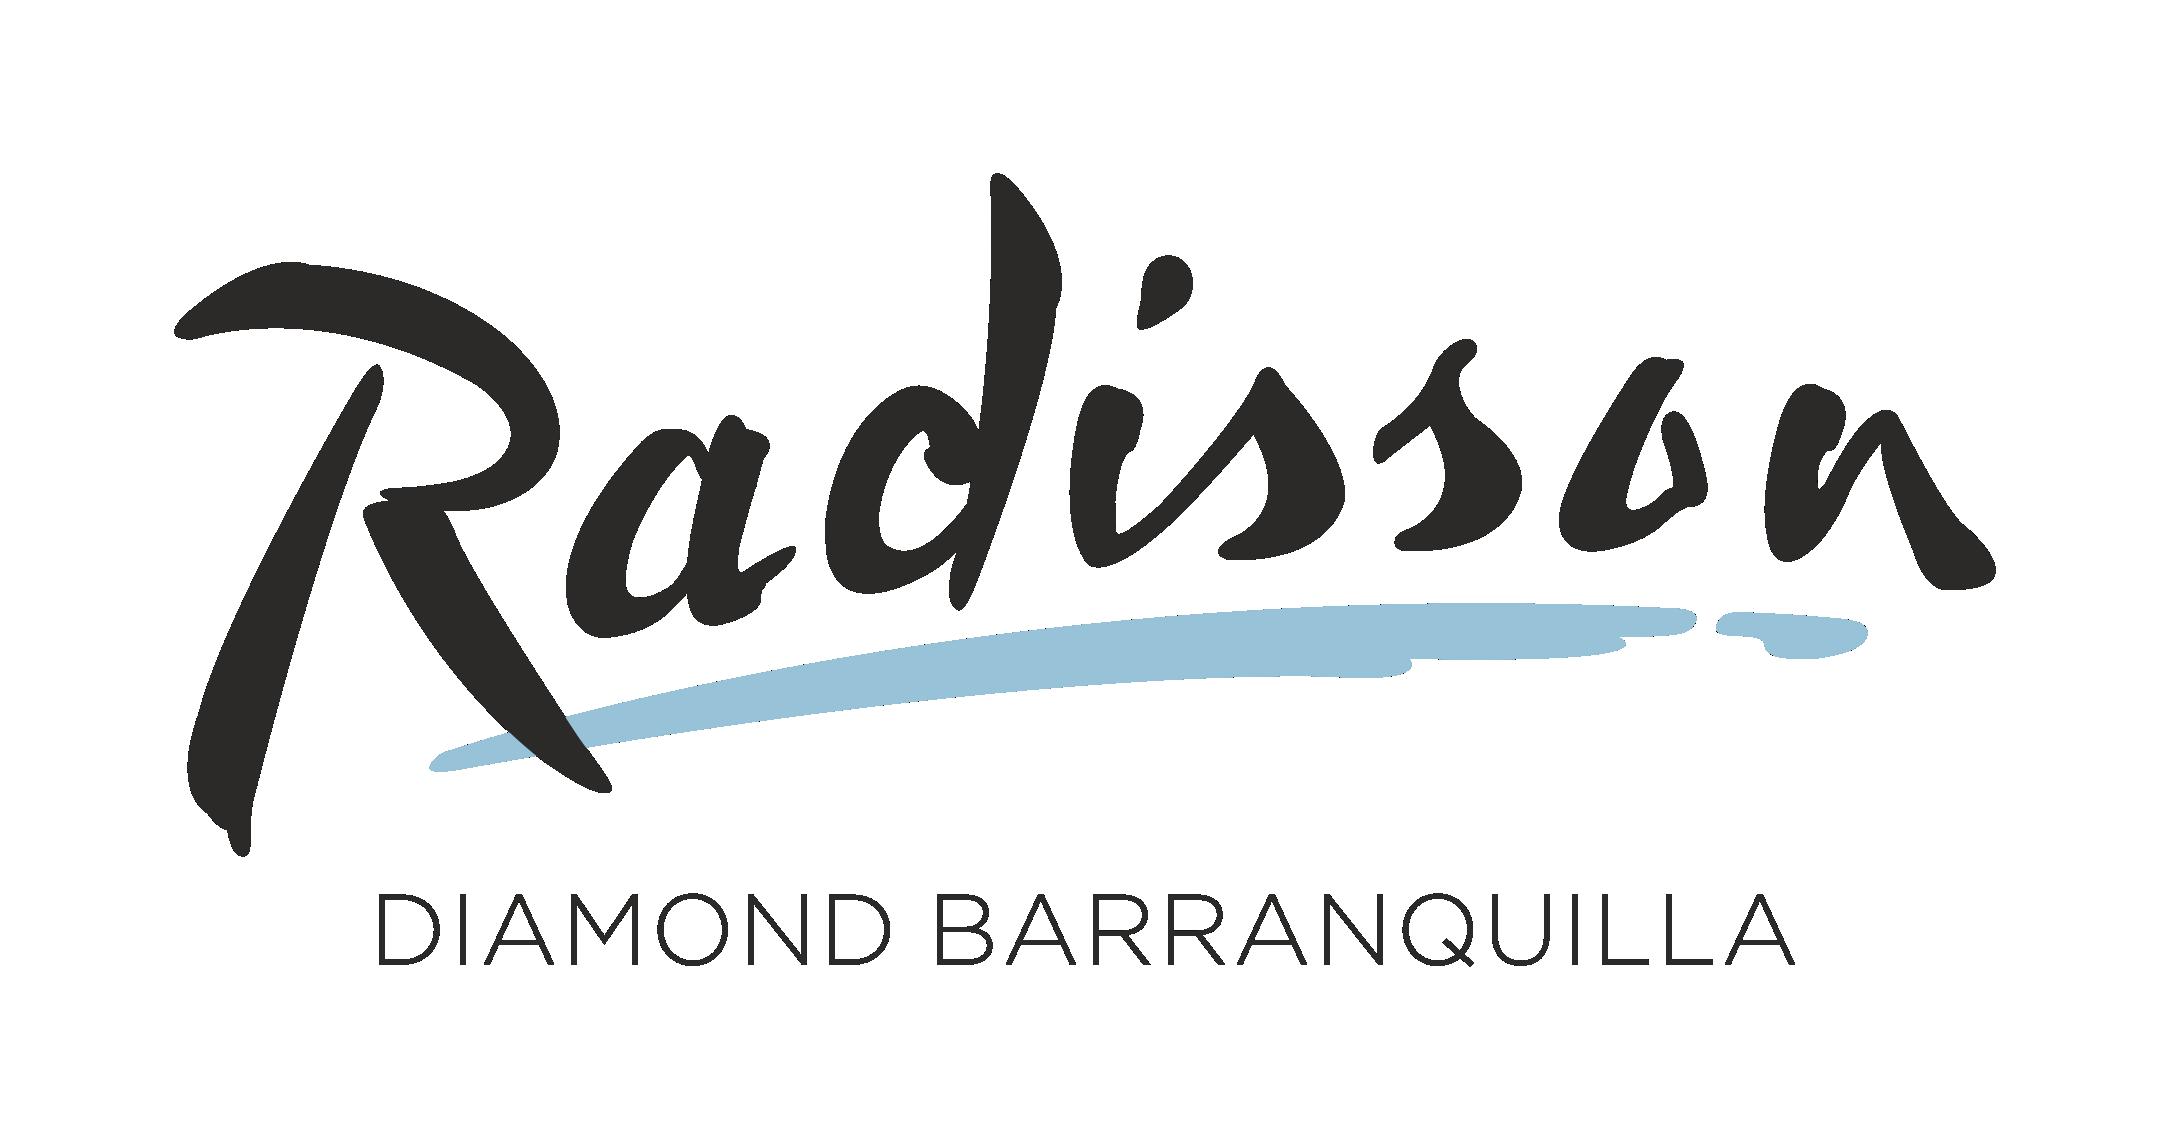 HOTEL RADISSON DIAMOND BARRANQUILLA